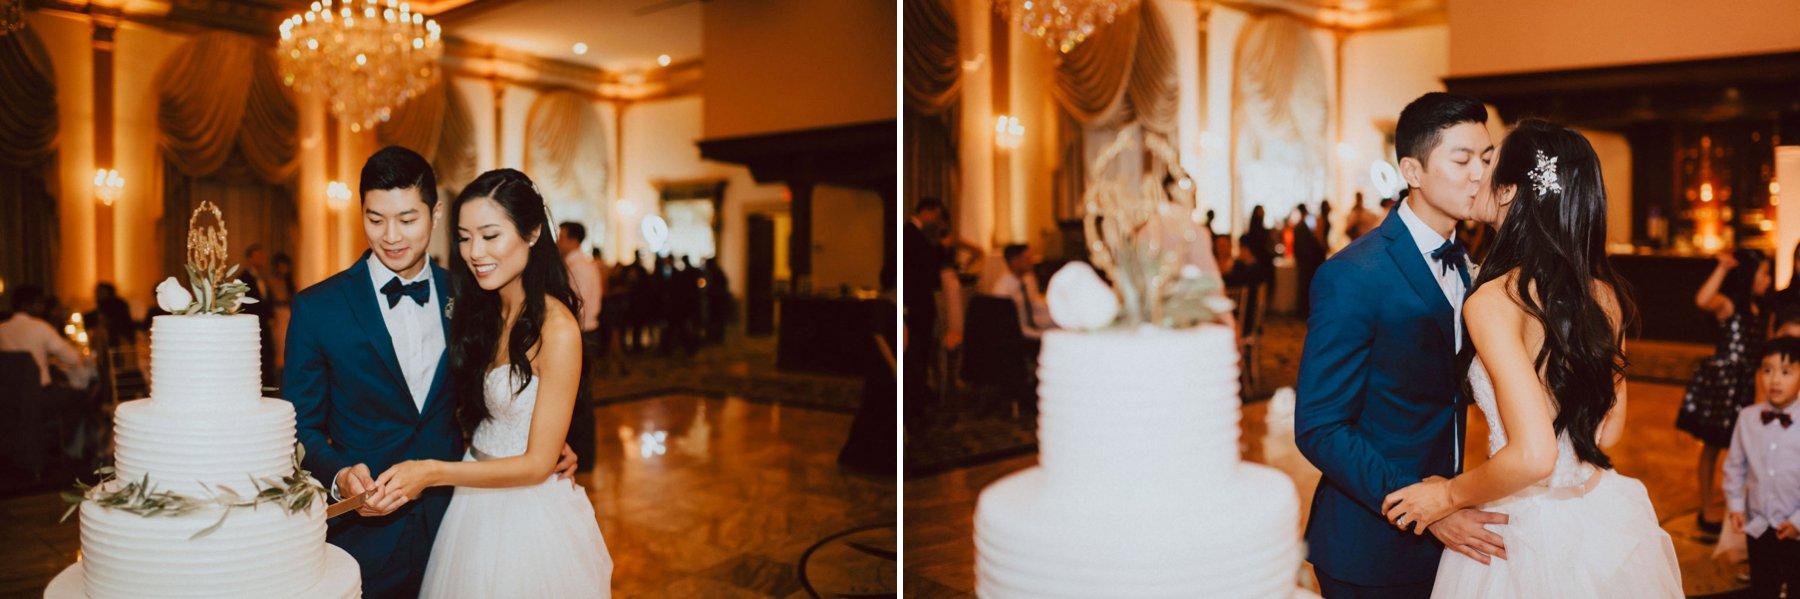 philadelphia-wedding-photographer-154.jpg